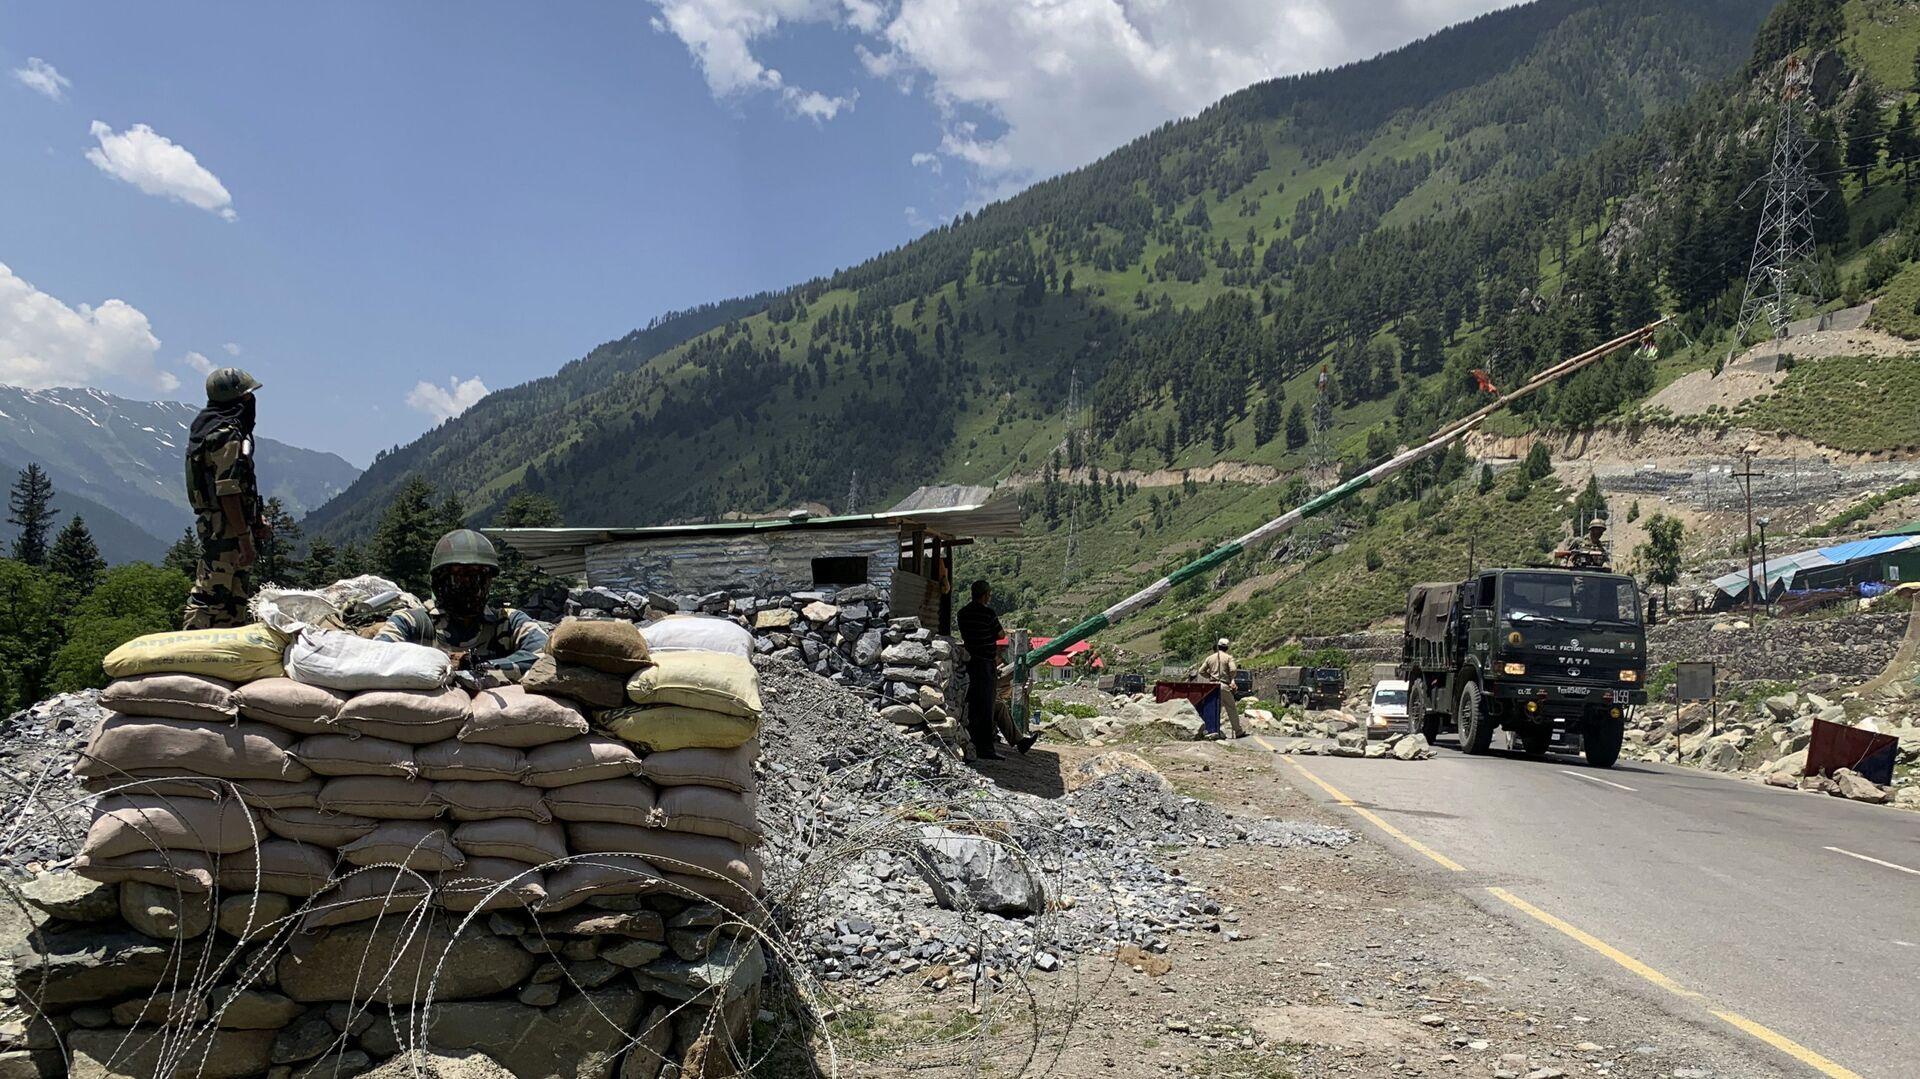 Indian paramilitary soldiers keep guard as Indian army convoy moves on the Srinagar-Ladakh highway at Gagangeer, north-east of Srinagar, India, Thursday, June 18, 2020. - Sputnik International, 1920, 19.09.2021